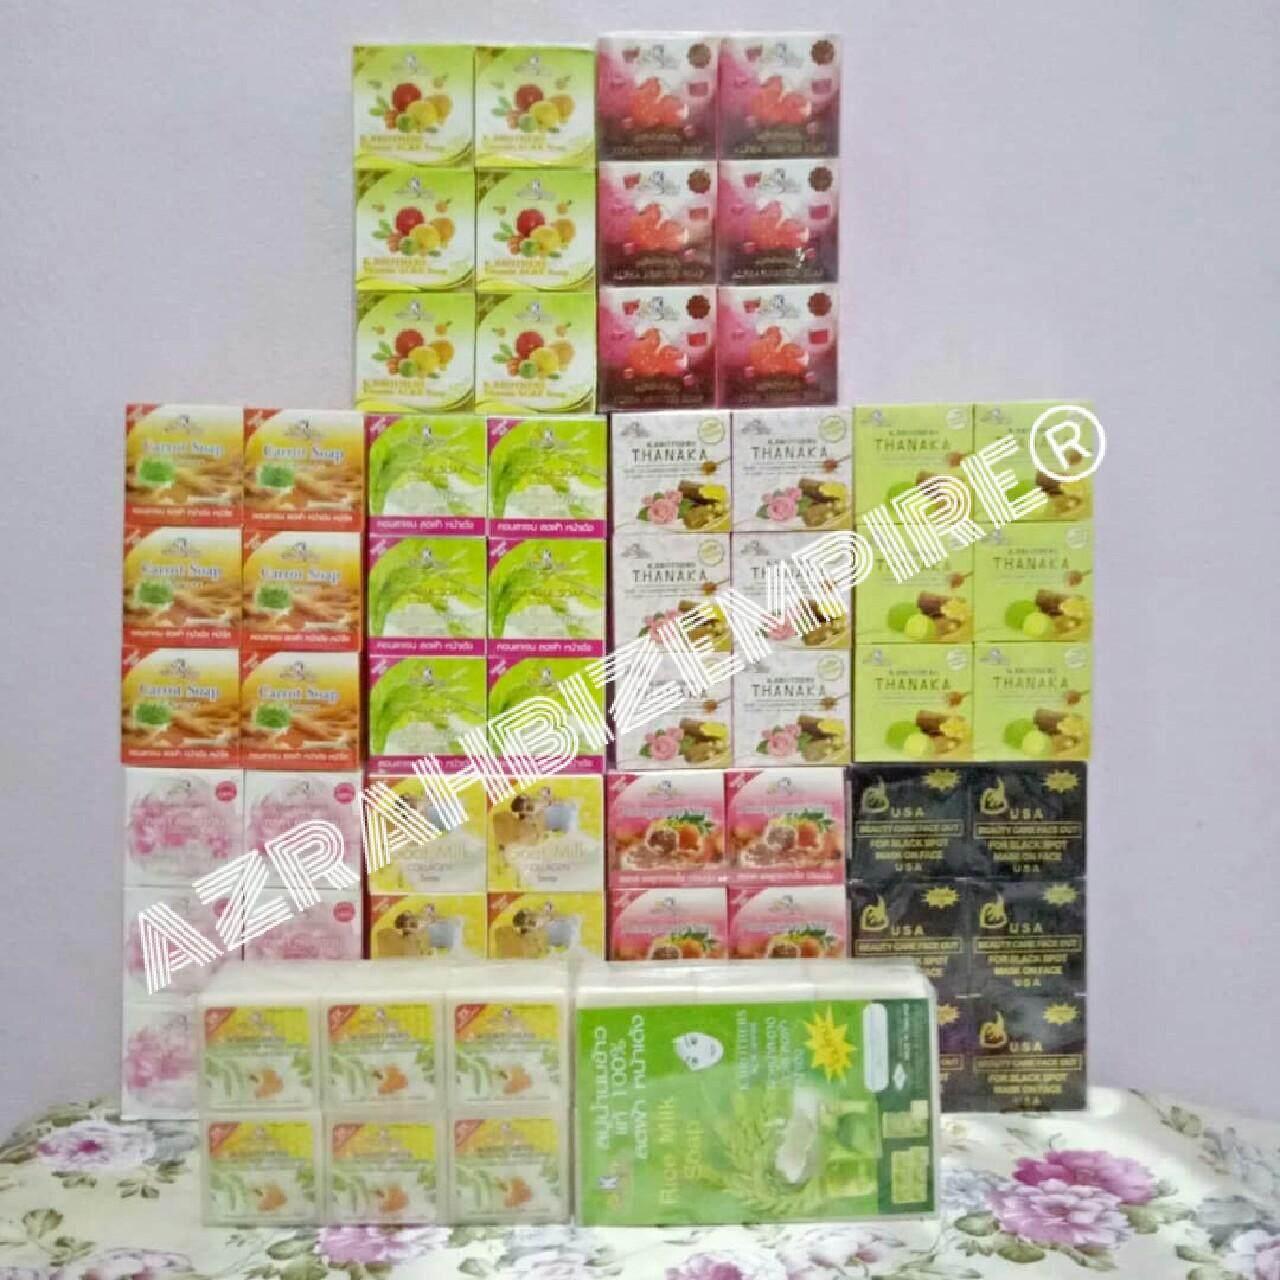 Top Deals For Health Beauty Only On Lazada Malaysia Sabun Susu Collagen 12pcs Beras K Brothers Pelbagai Jenis